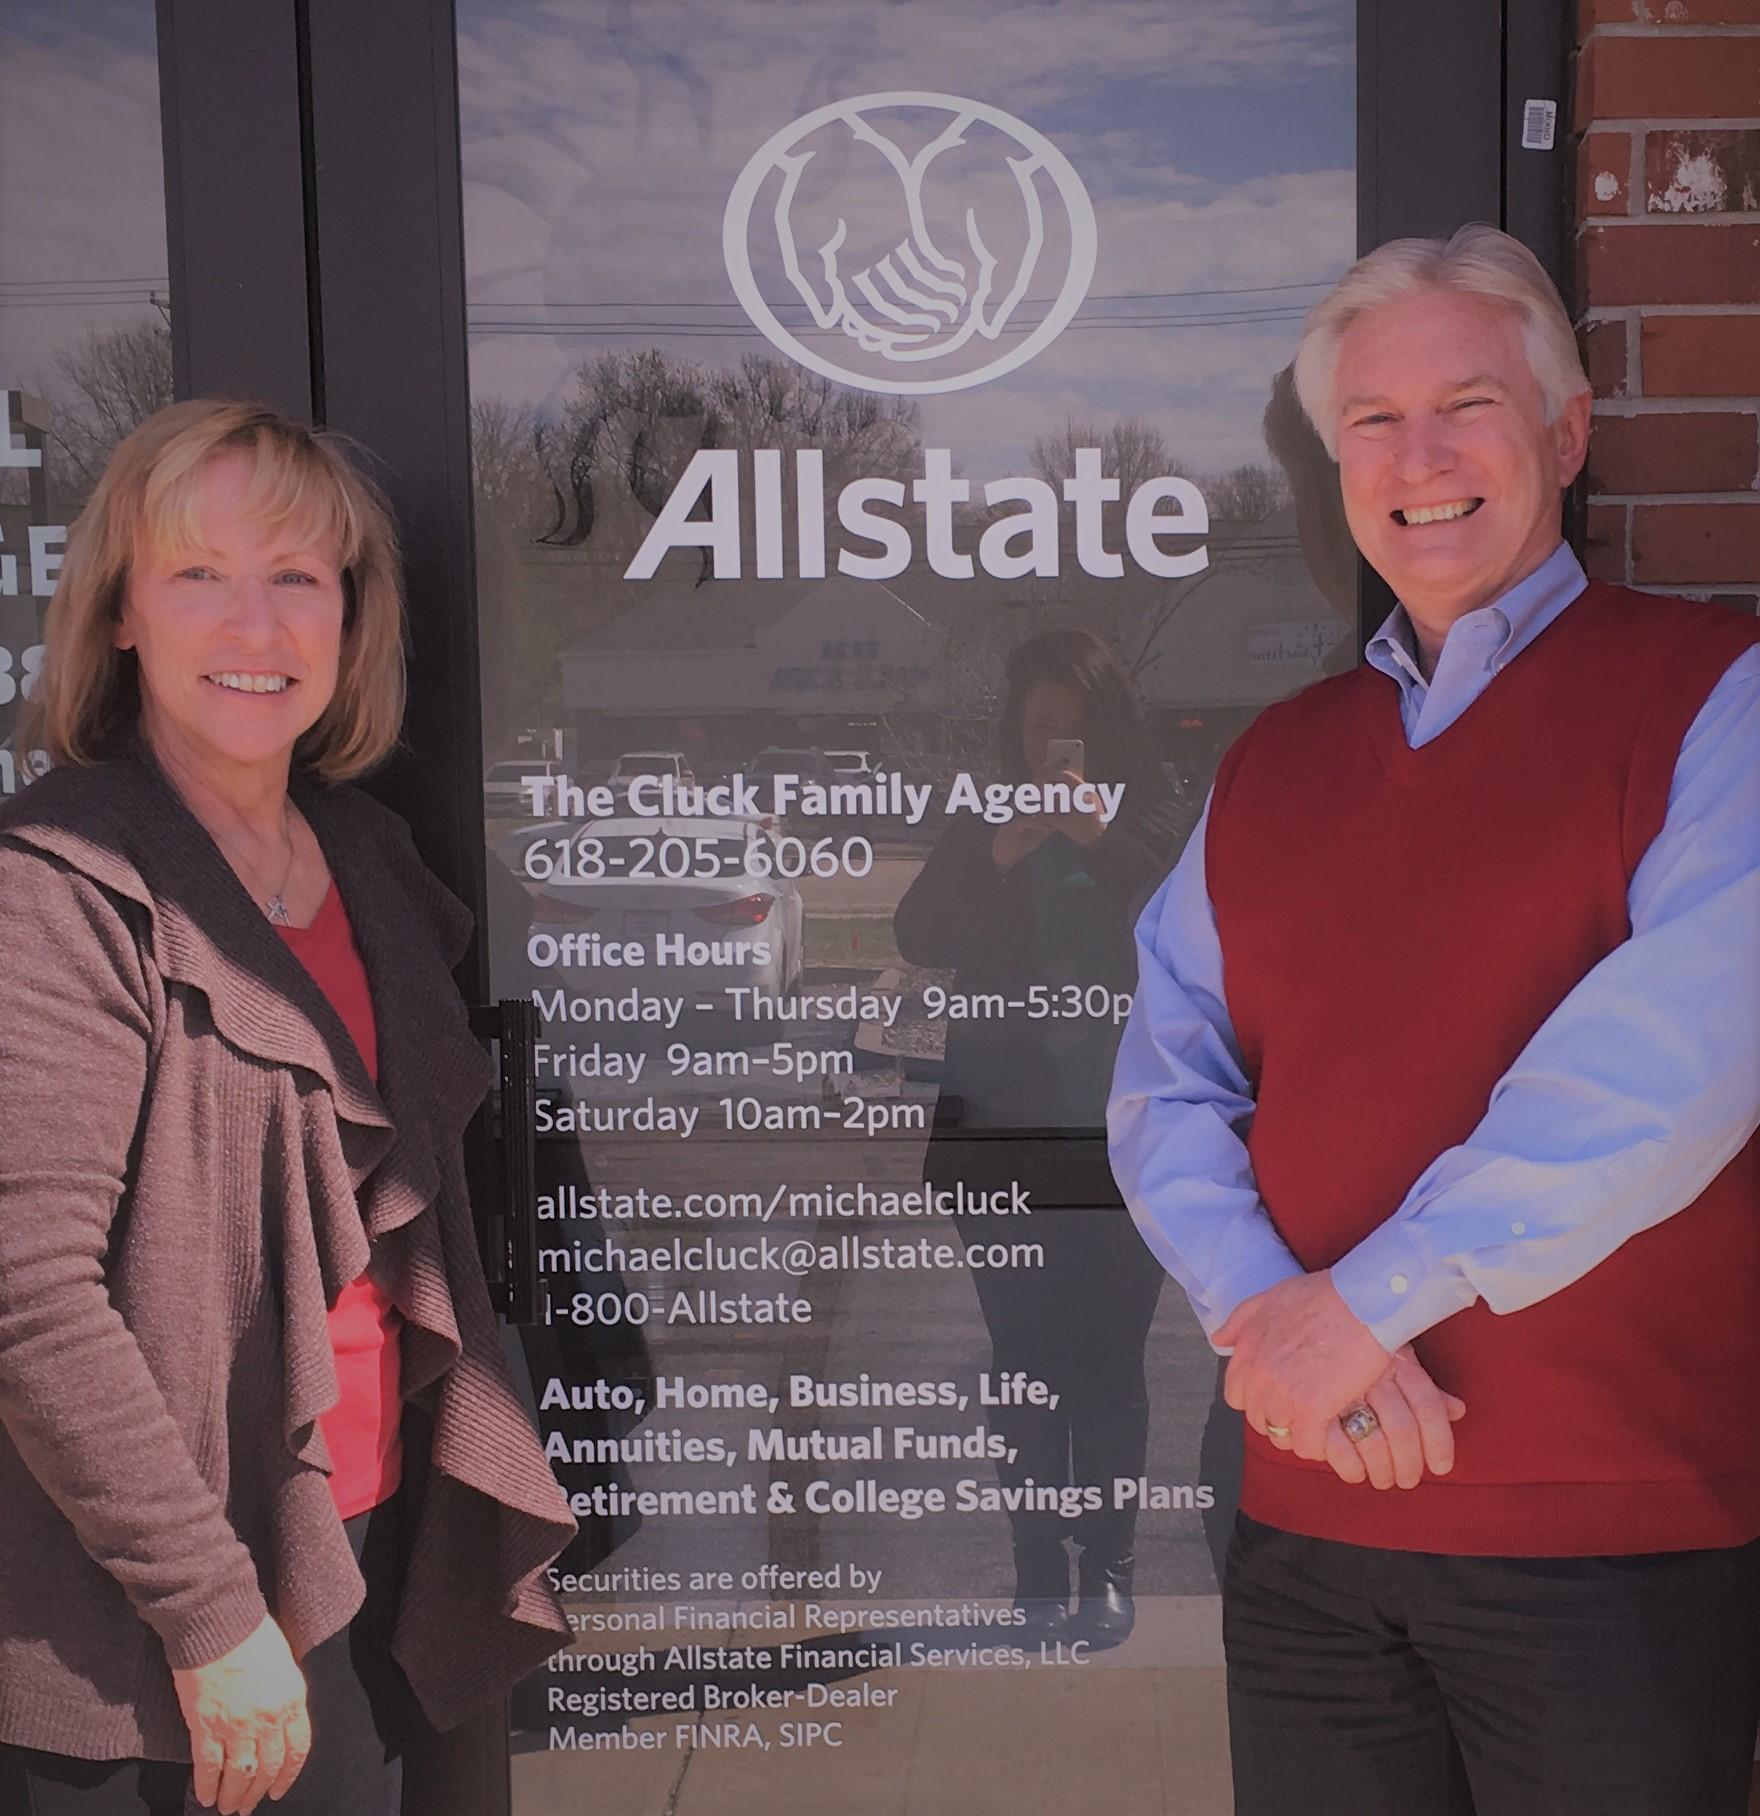 Allstate Insurance Quote: Michael Cluck: Allstate Insurance In Glen Carbon, IL 62034